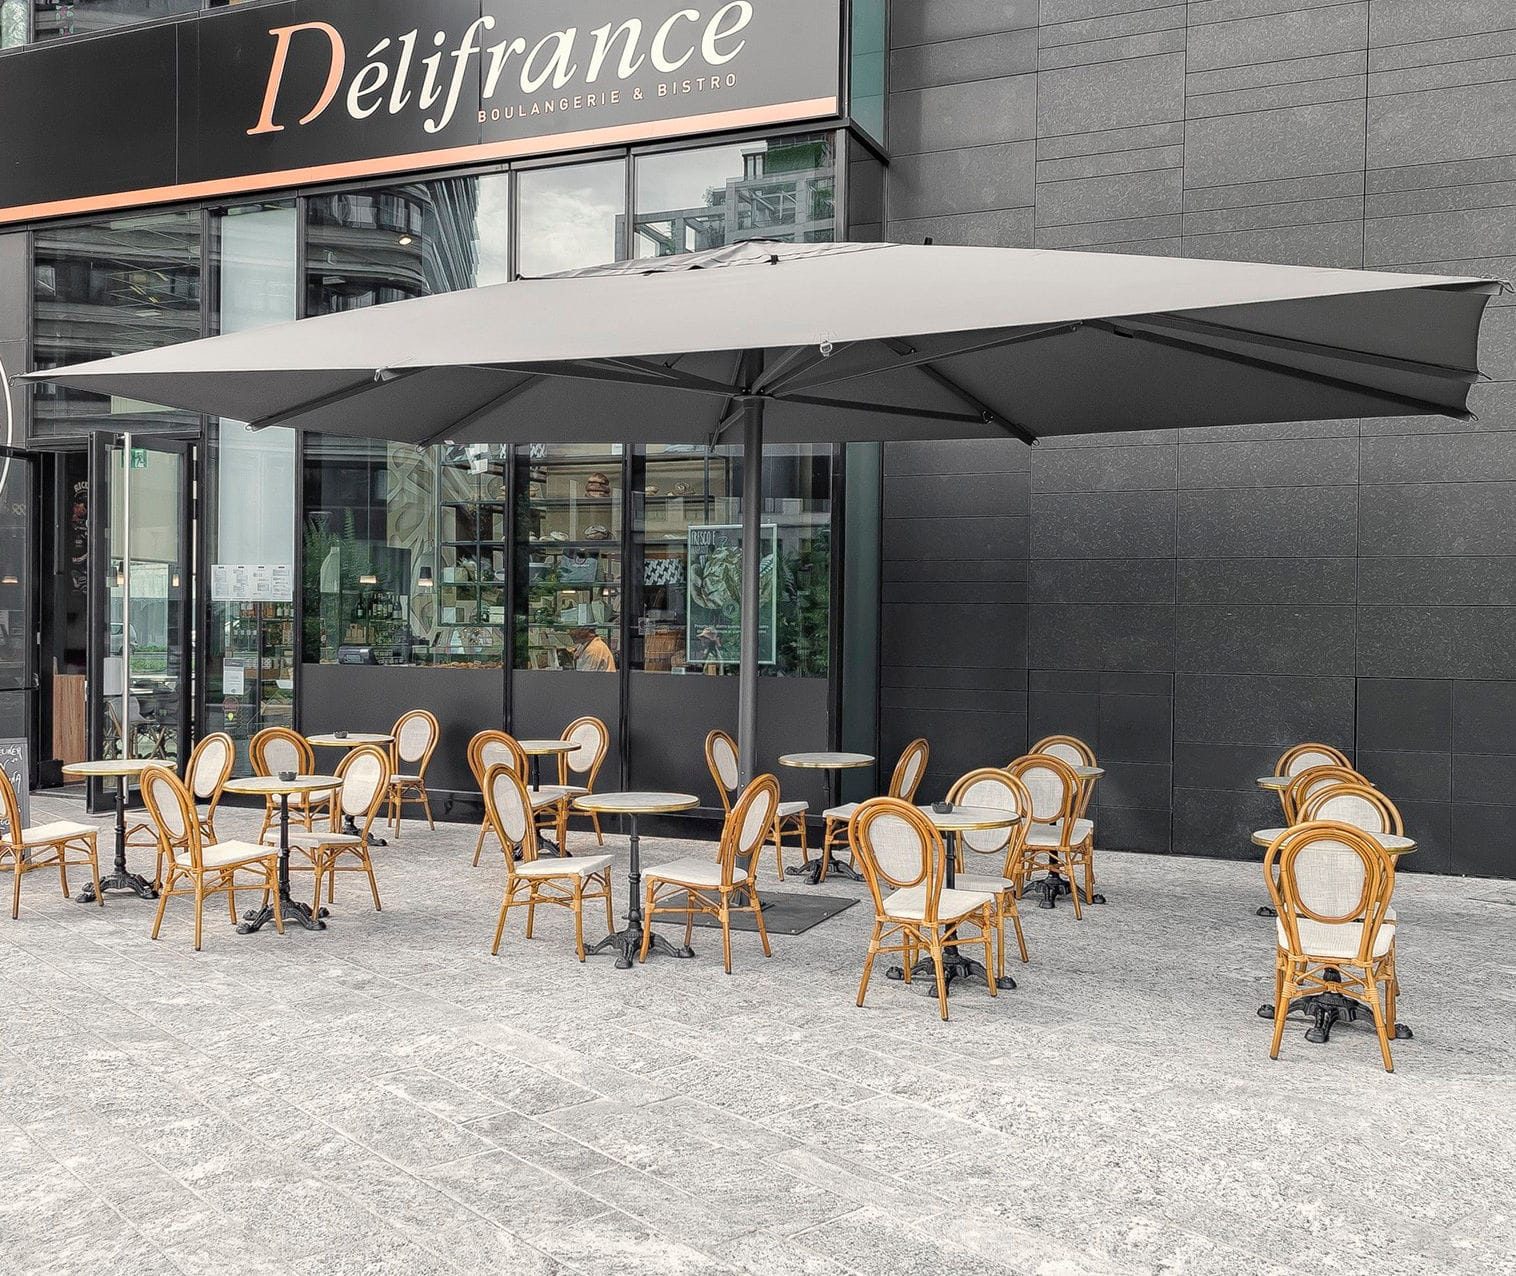 mercial patio umbrella fabric wind resistant DEHOR